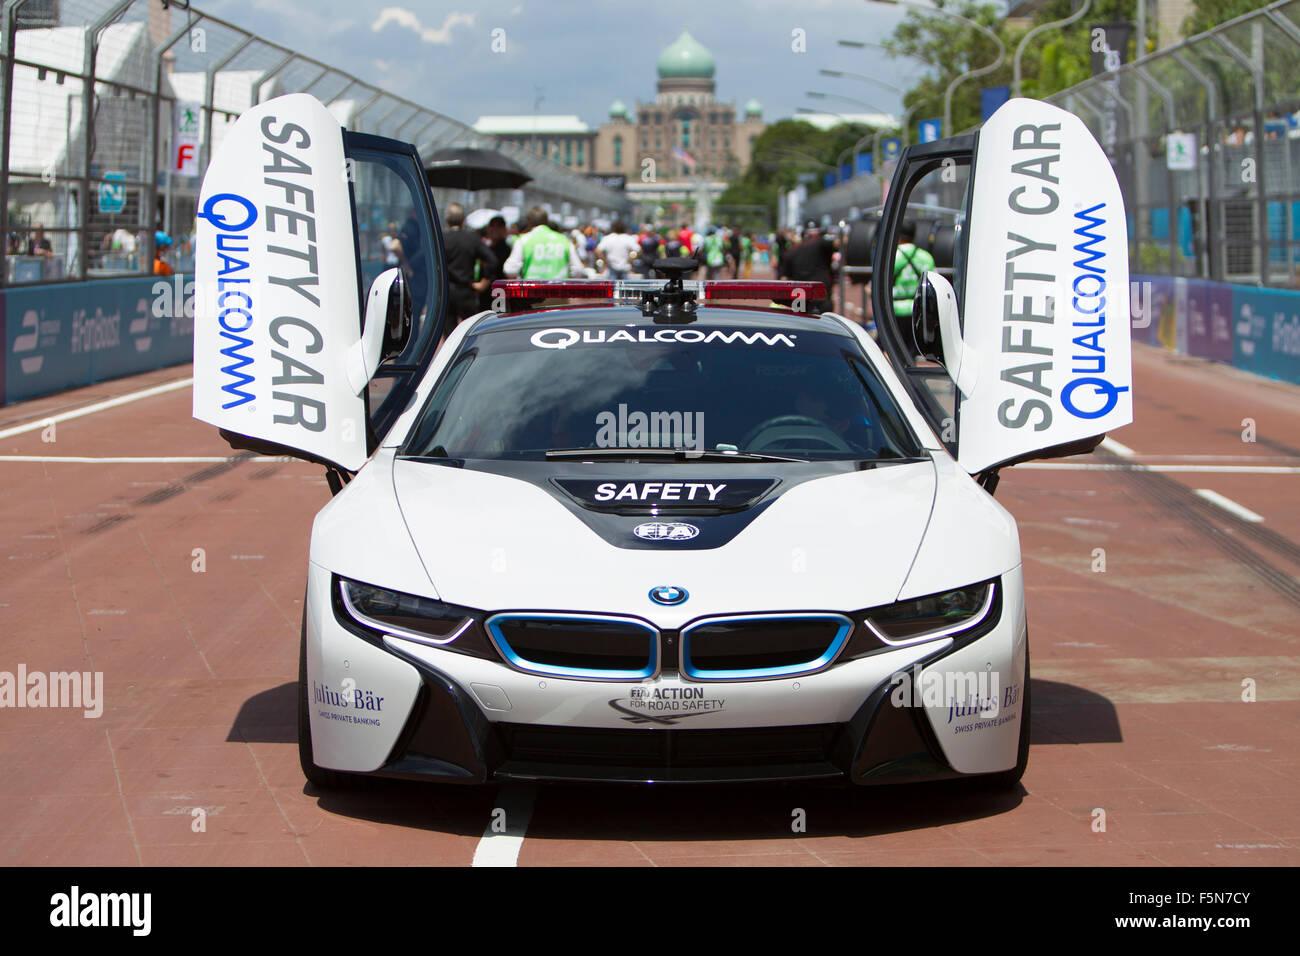 Putrajaya Malaysia November 7 2015 Fia Bmw I8 Safety Cars